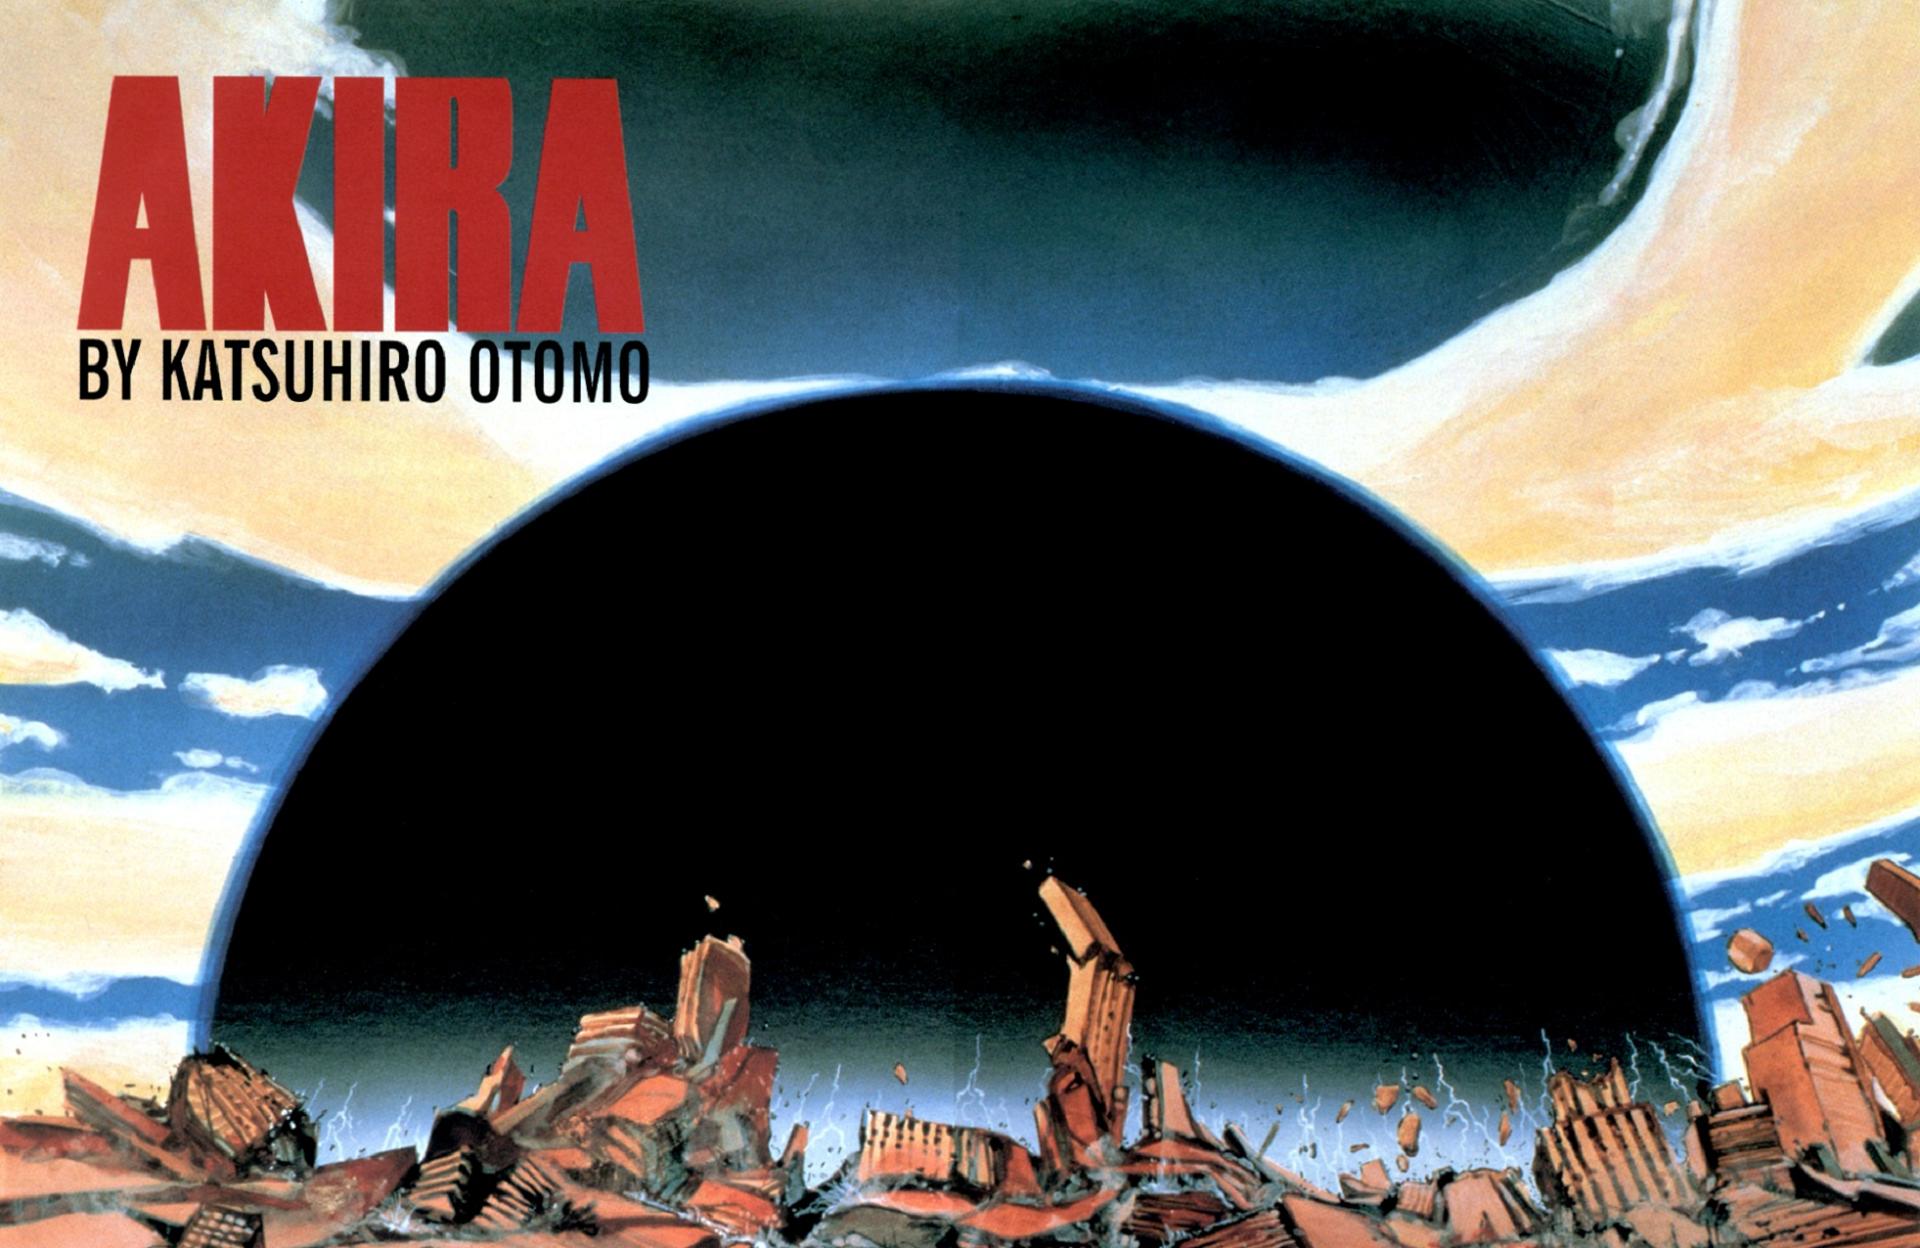 Wallpaper Manga Poster Akira Katsuhiro Otomo Art Album Cover 1920x1248 Bas123 61948 Hd Wallpapers Wallhere